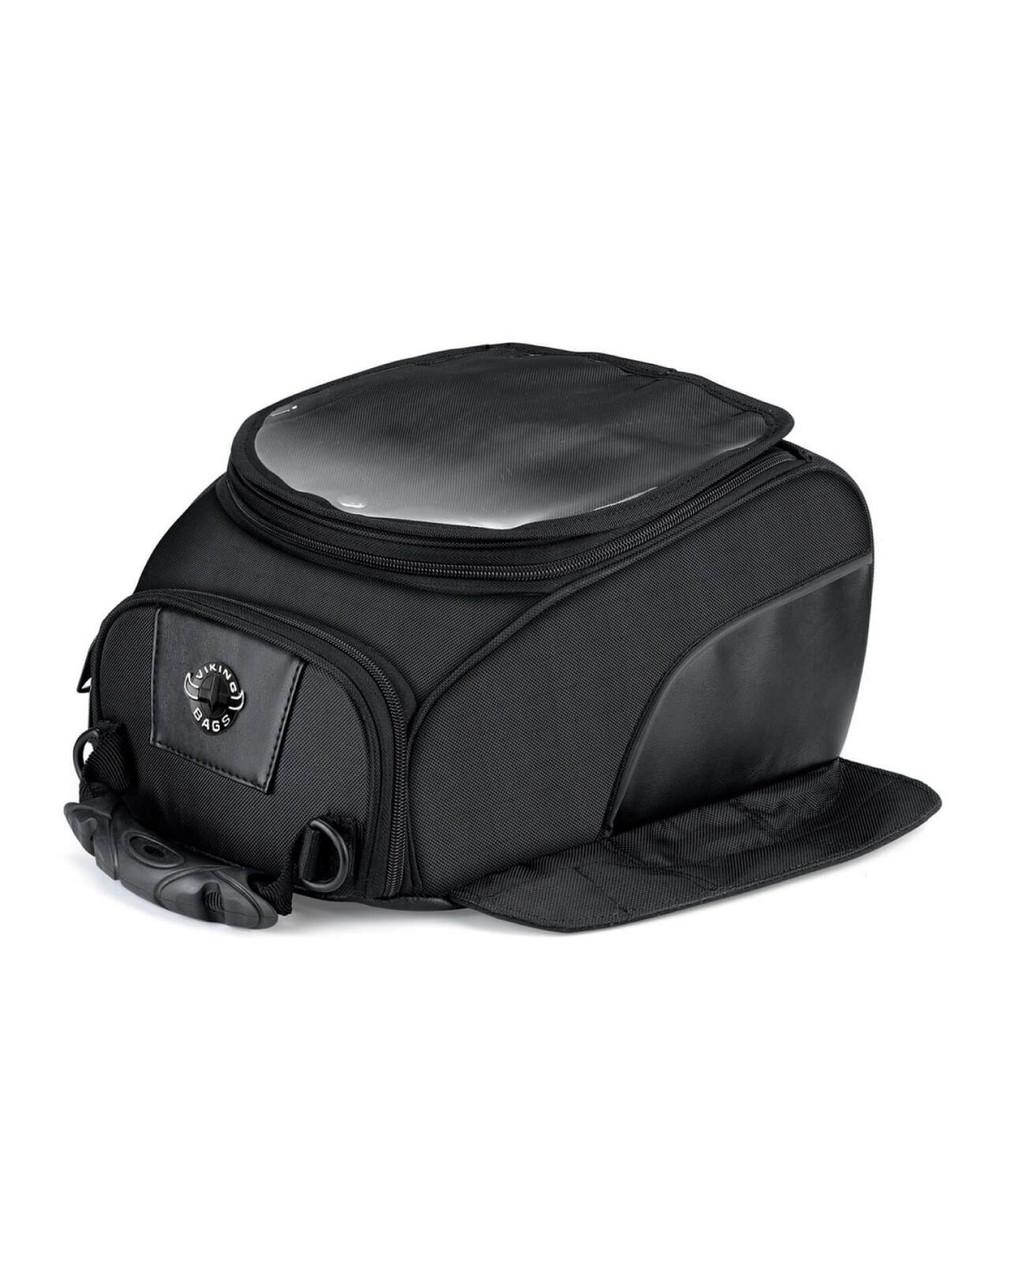 VikingBags 14 Large Suzuki Magnetic Motorcycle Tank Bag Main Bag View